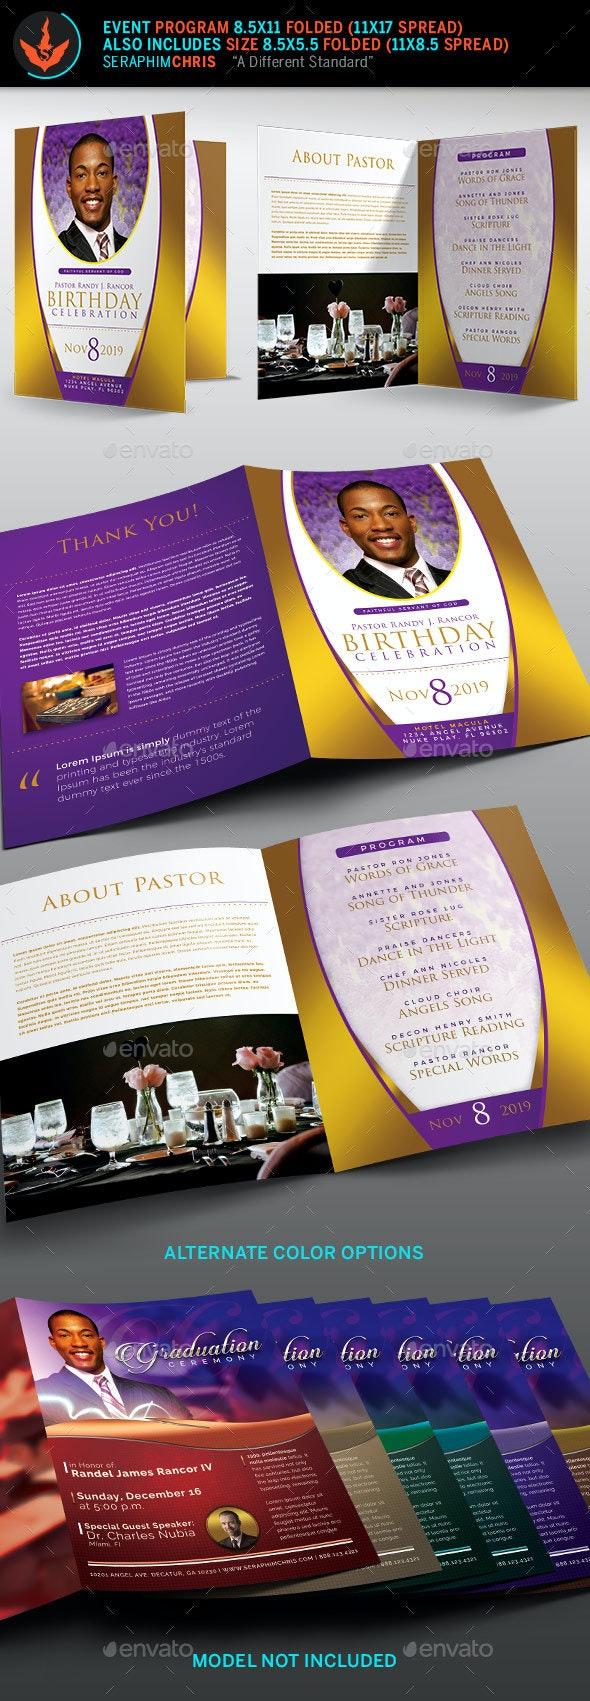 Royal Pastor Birthday Party Program Template - Informational Brochures